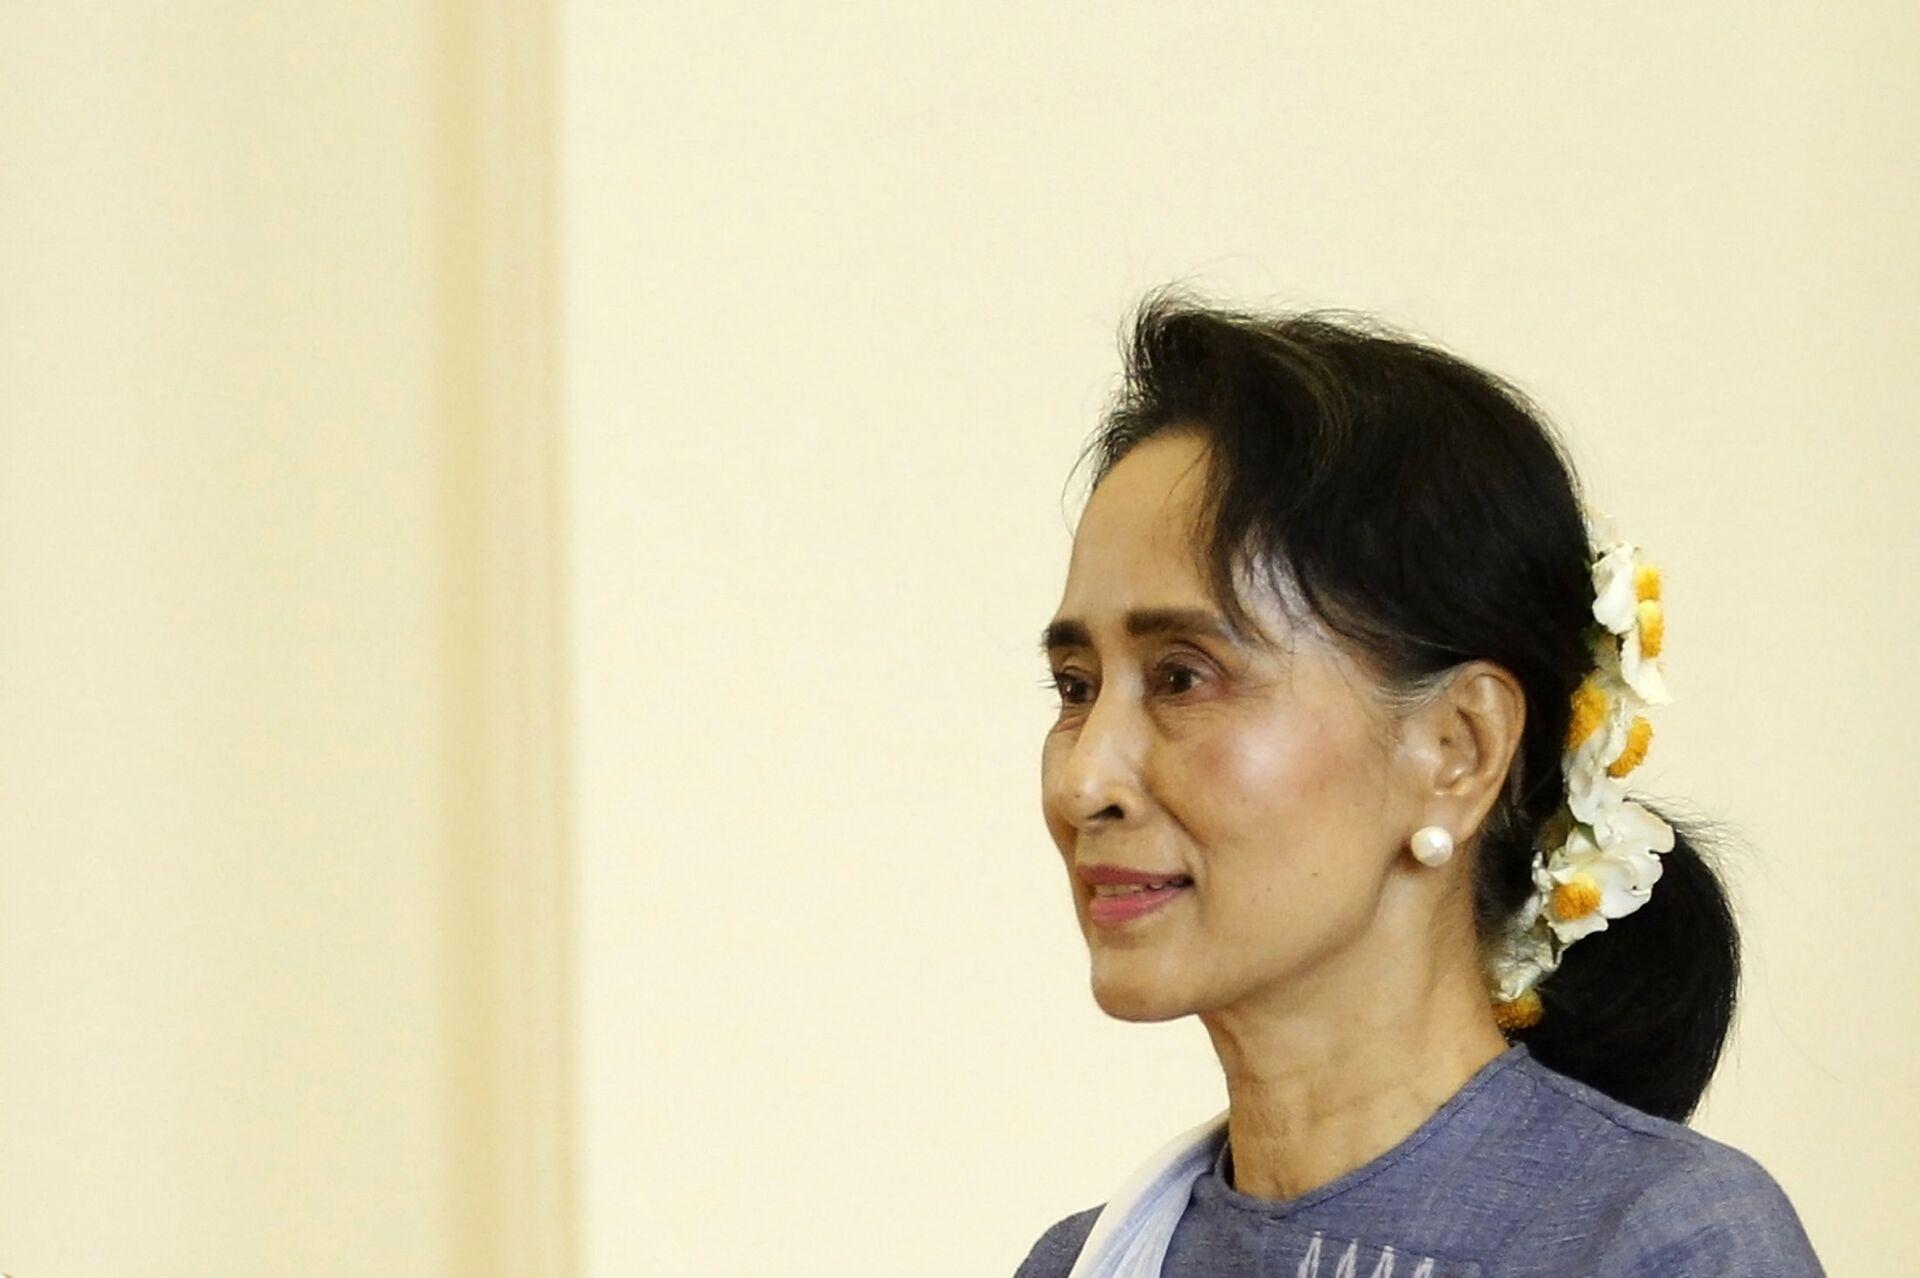 Aung San Suu Kyi, exconsejera de Estado de Birmania - Sputnik Mundo, 1920, 11.02.2021